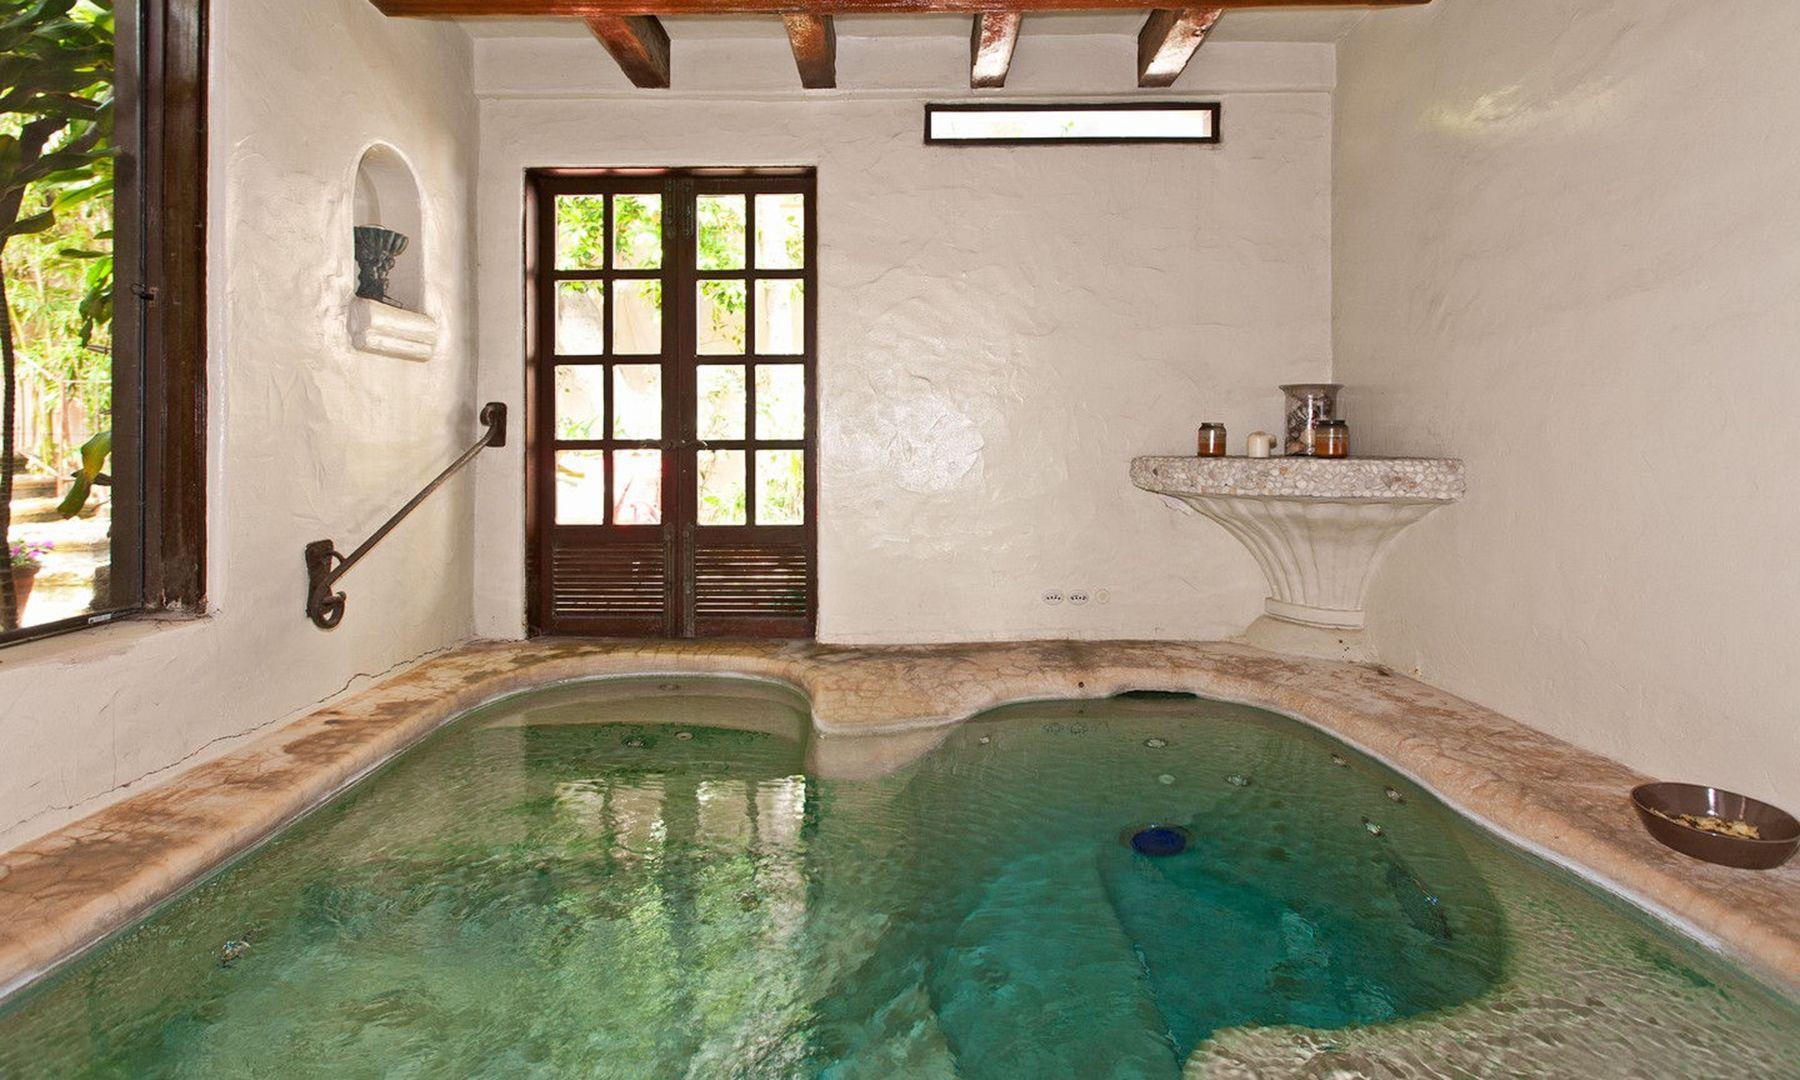 Mariah Carey S 30 Million Malibu Summer Rental Home Dujour Renting A House Malibu Homes House Rental